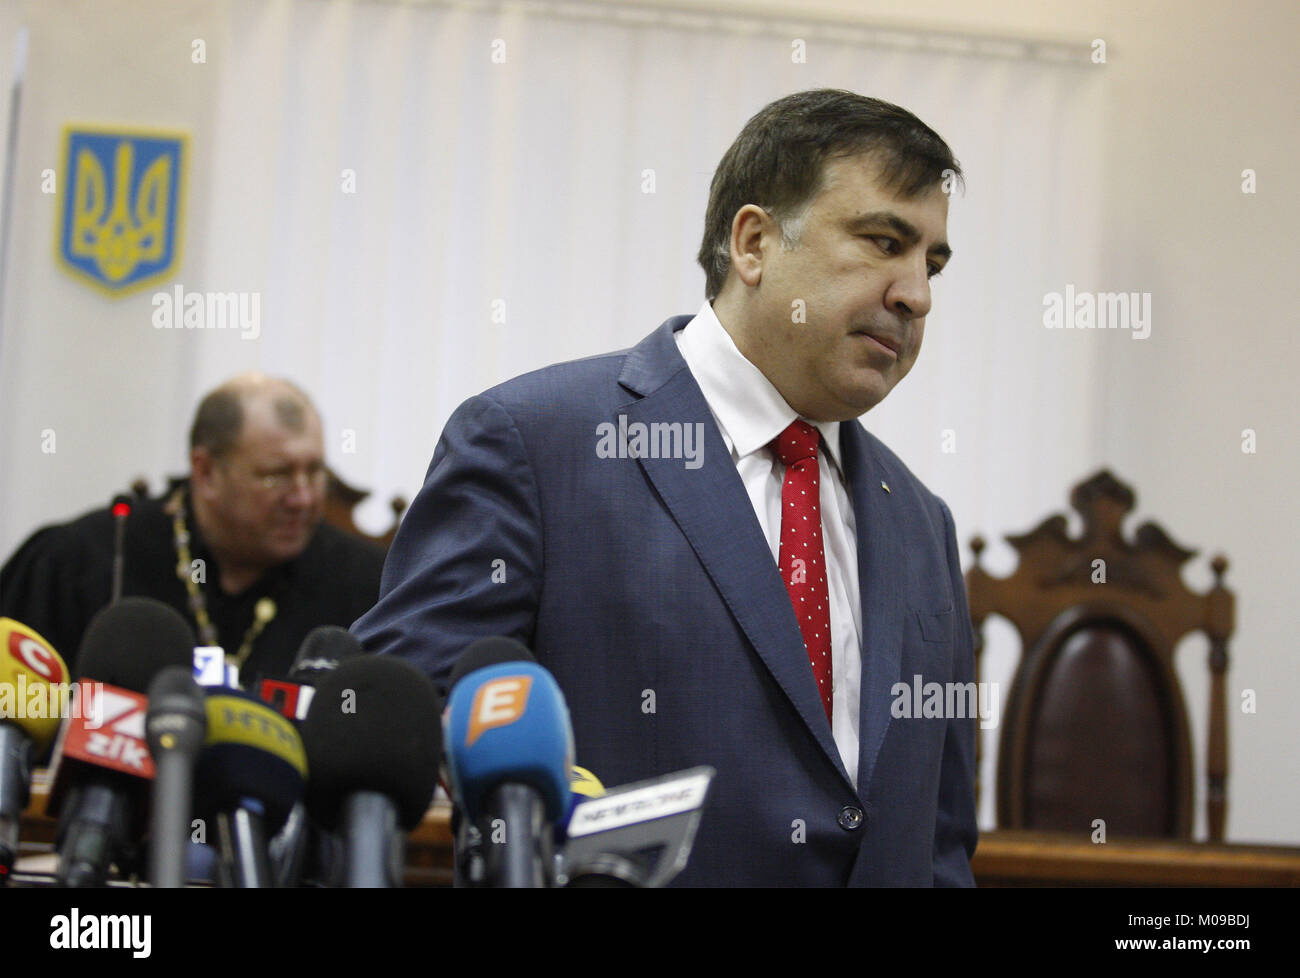 Kiev, Ukraine. 19th Jan, 2018. Former Georgian president and ex-Odessa Governor MIKHEIL SAAKASHVILI (C) attends - Stock Image